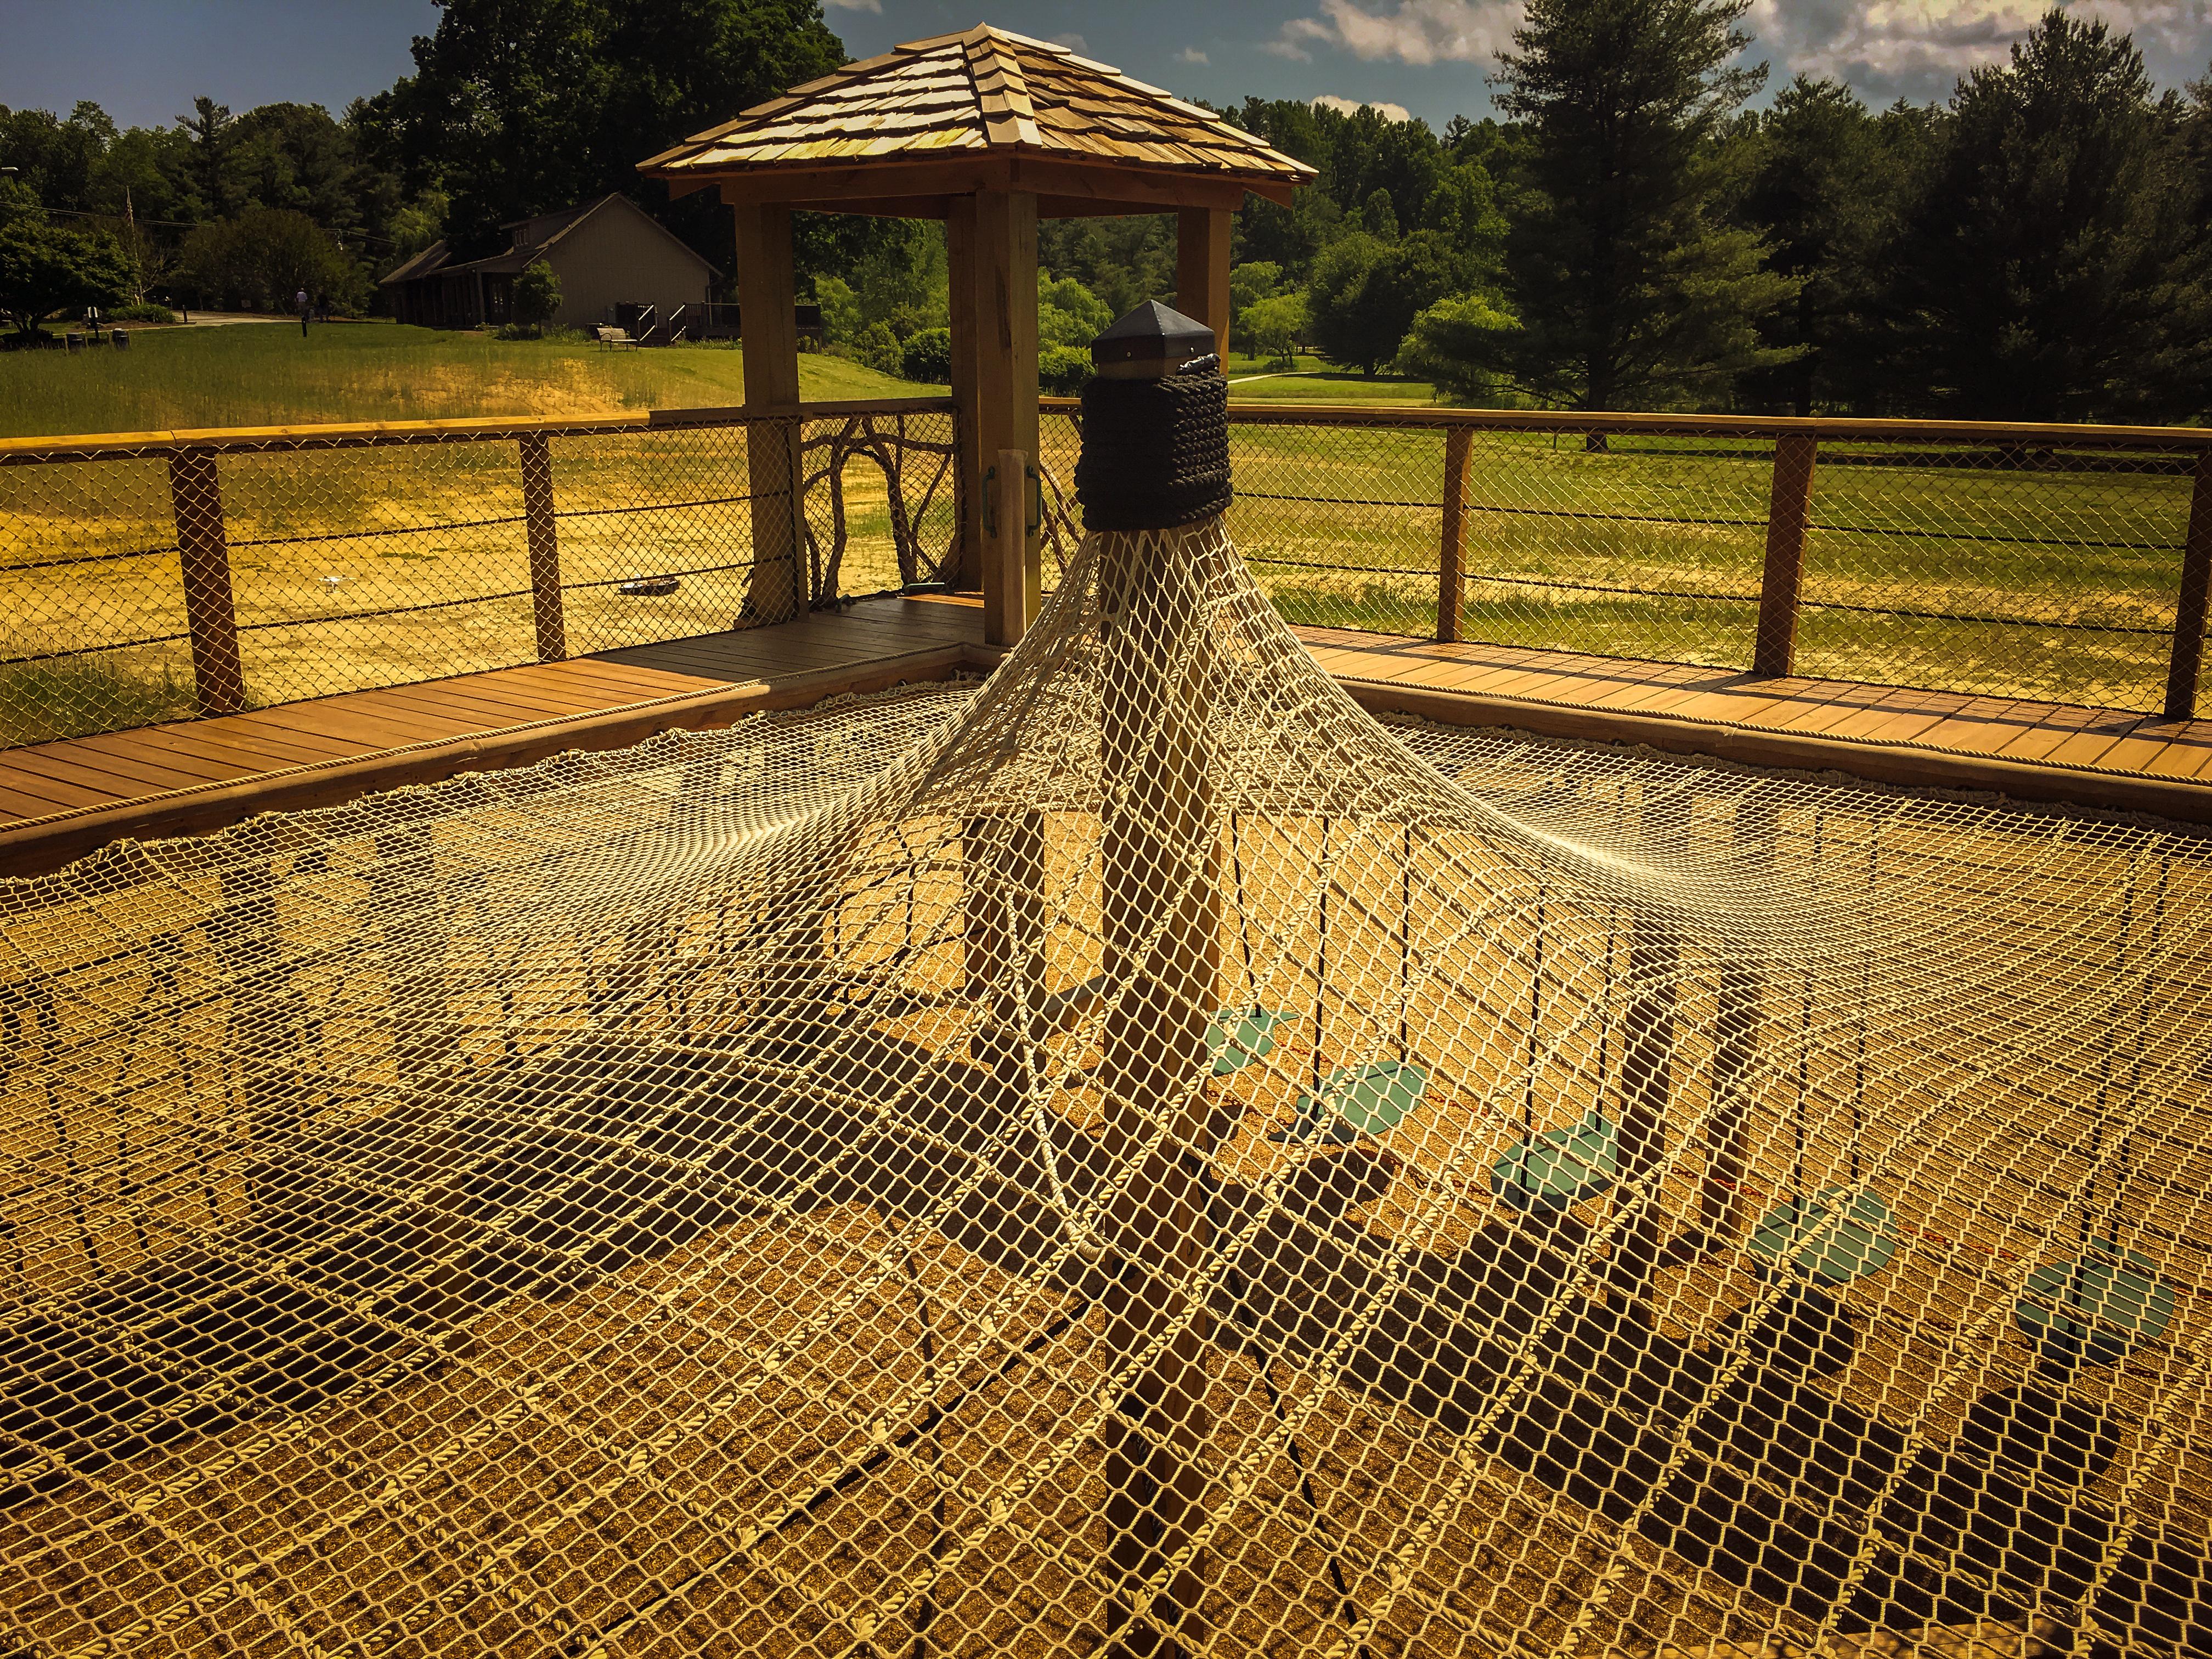 Sky hammock